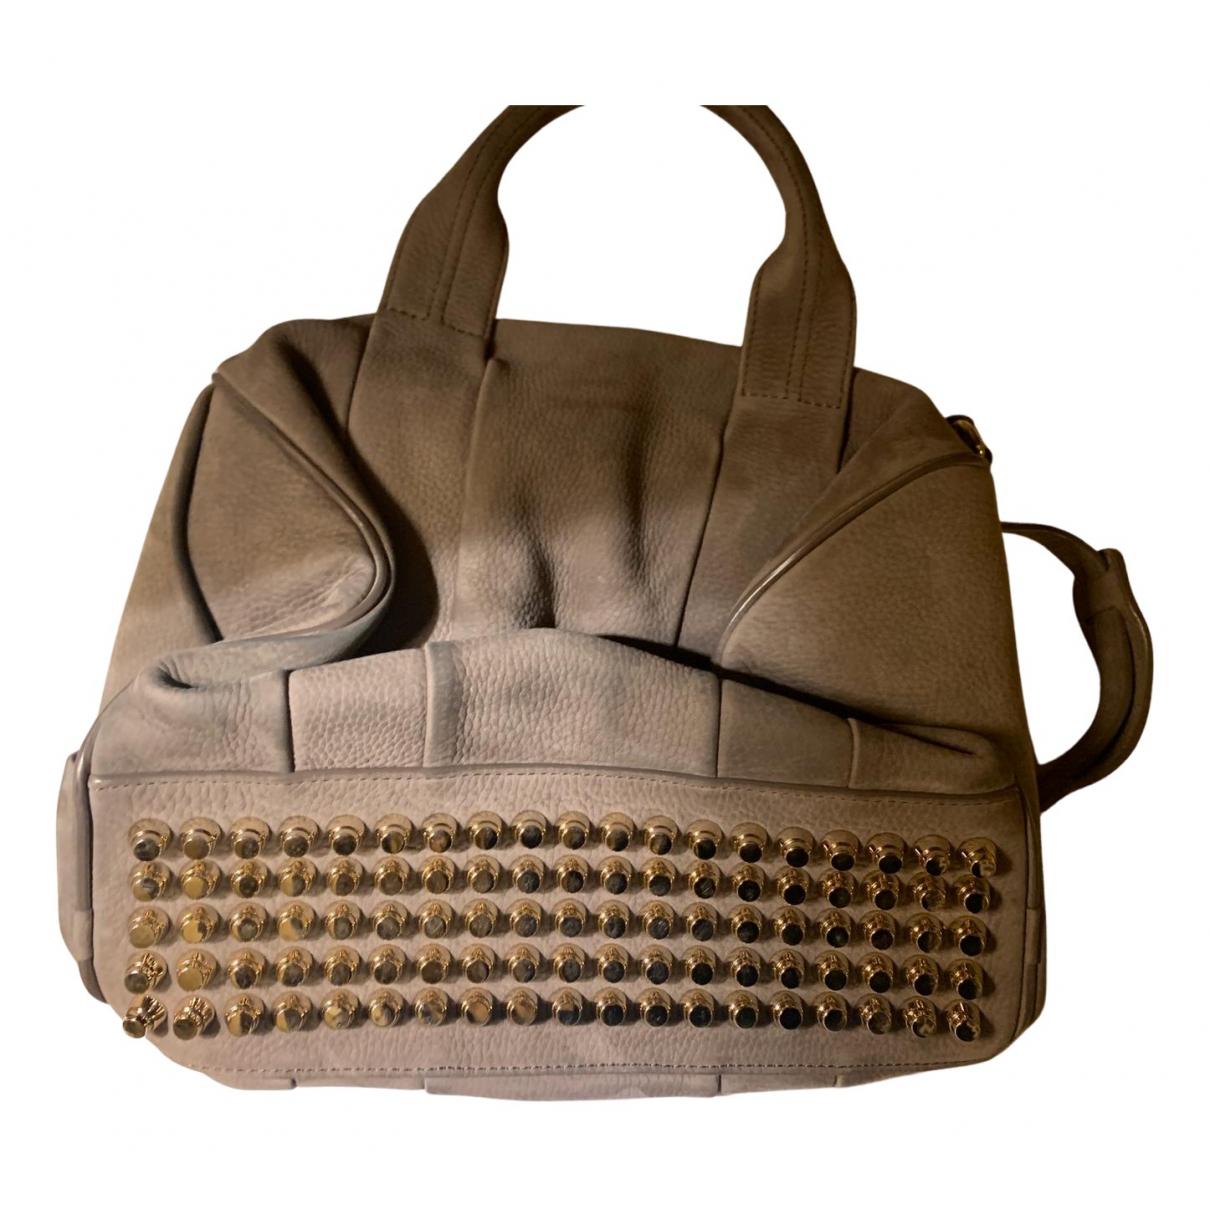 Alexander Wang Rocco Grey Suede handbag for Women N